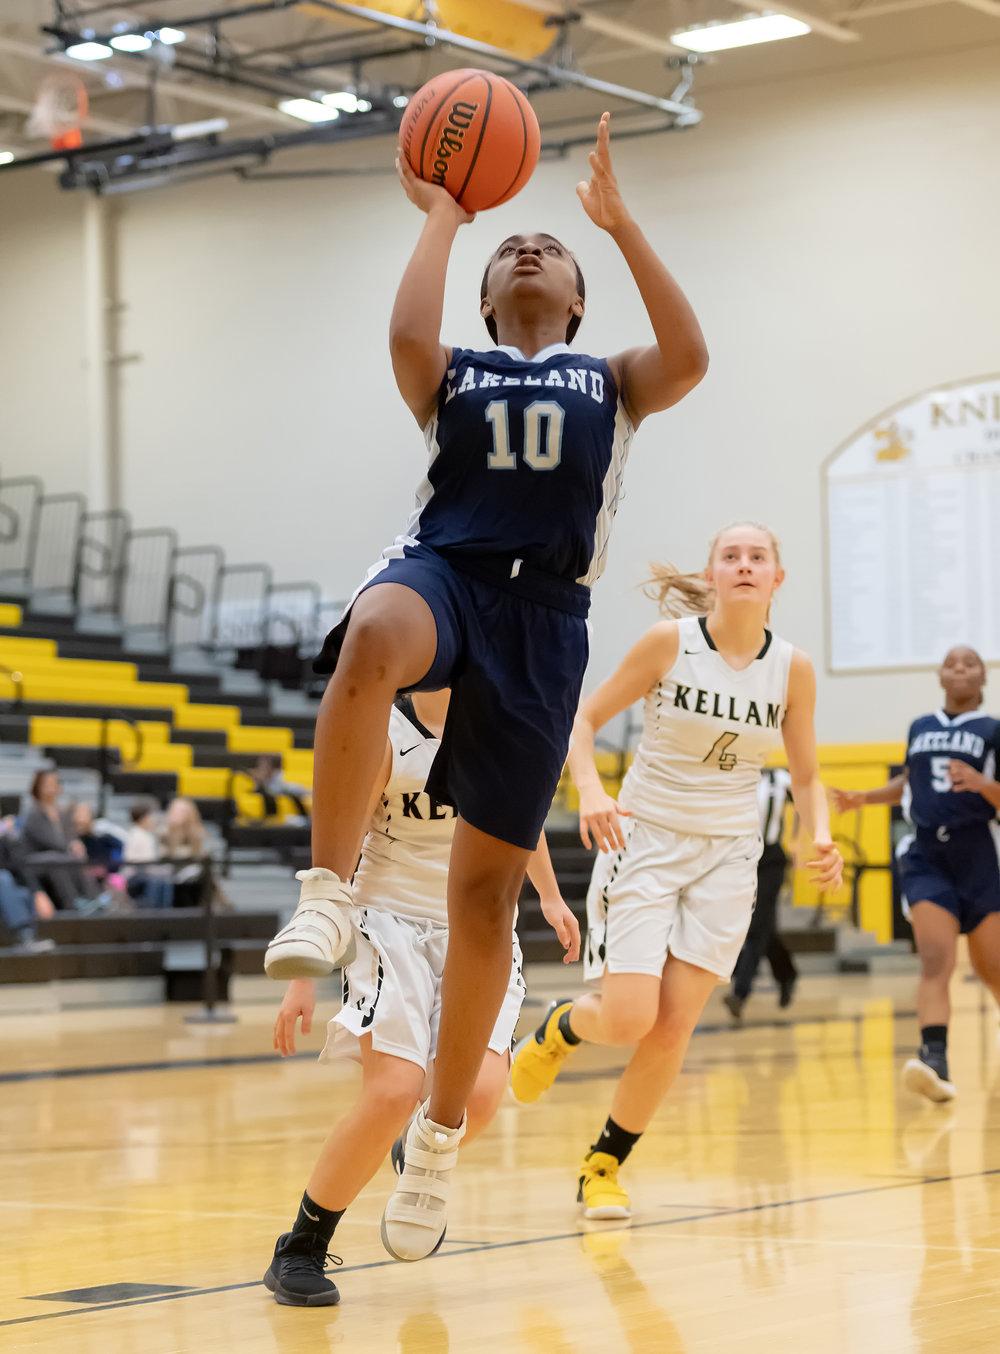 Game action from Lakeland vs Kellam girls basketball held on Thursday, November 29, 2018 at Kellam High School in Virginia Beach. Kellam defeated Lakeland 45 to 41.